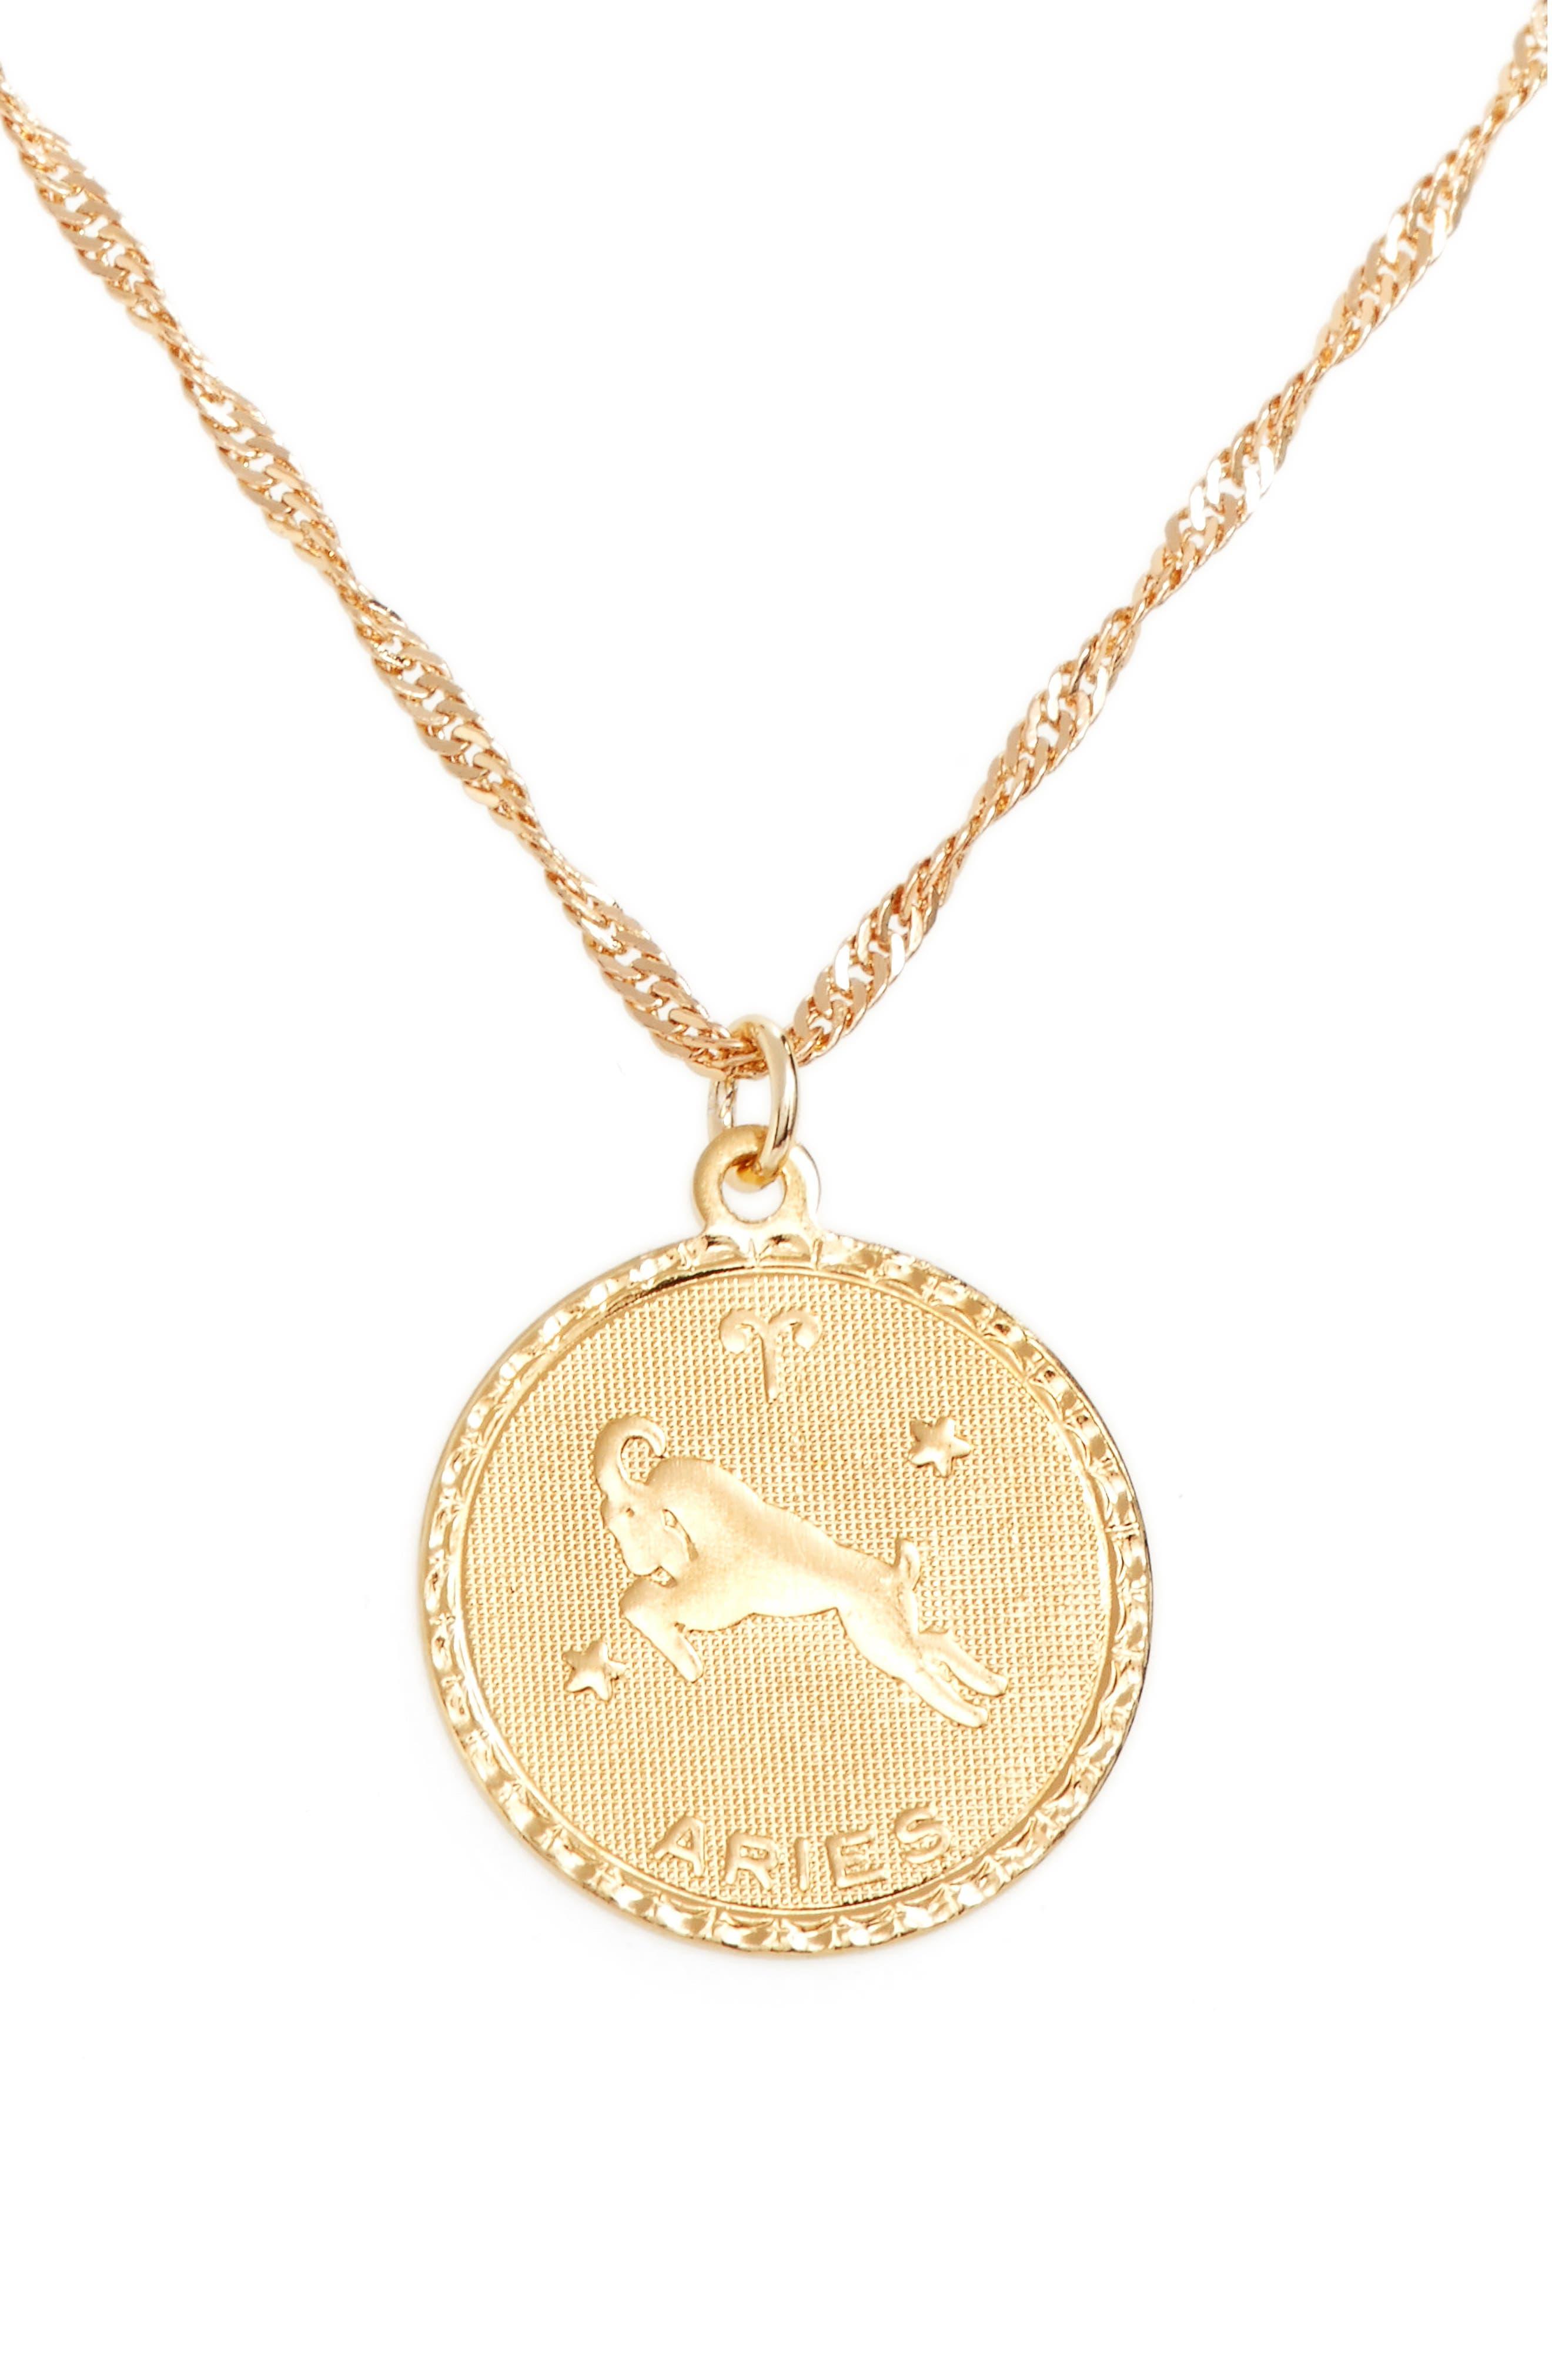 Ascending Aries Pendant Necklace,                         Main,                         color, Yellow Gold